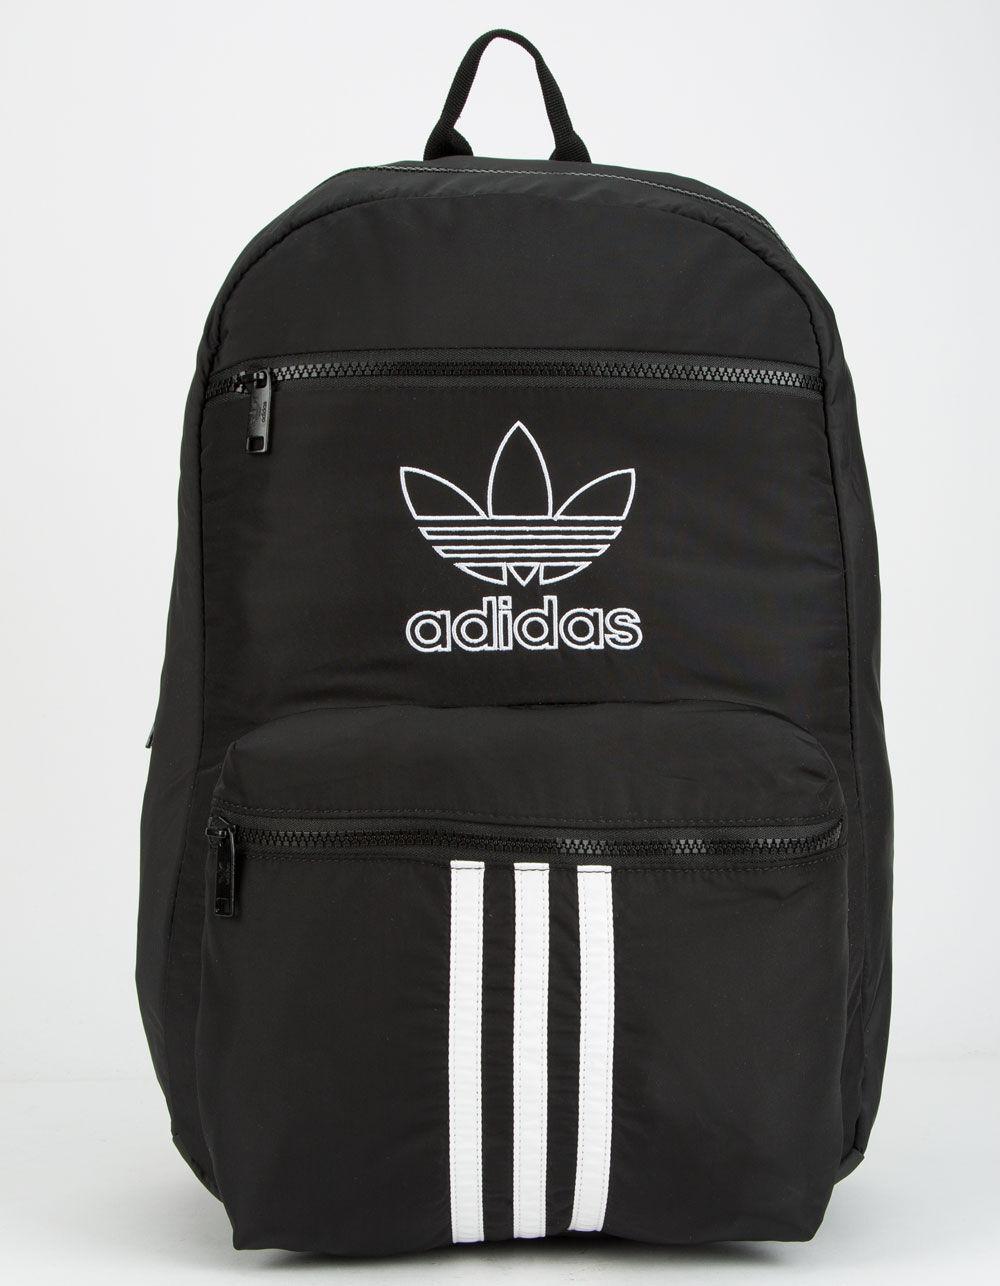 ADIDAS National 3-Stripes Black Backpack